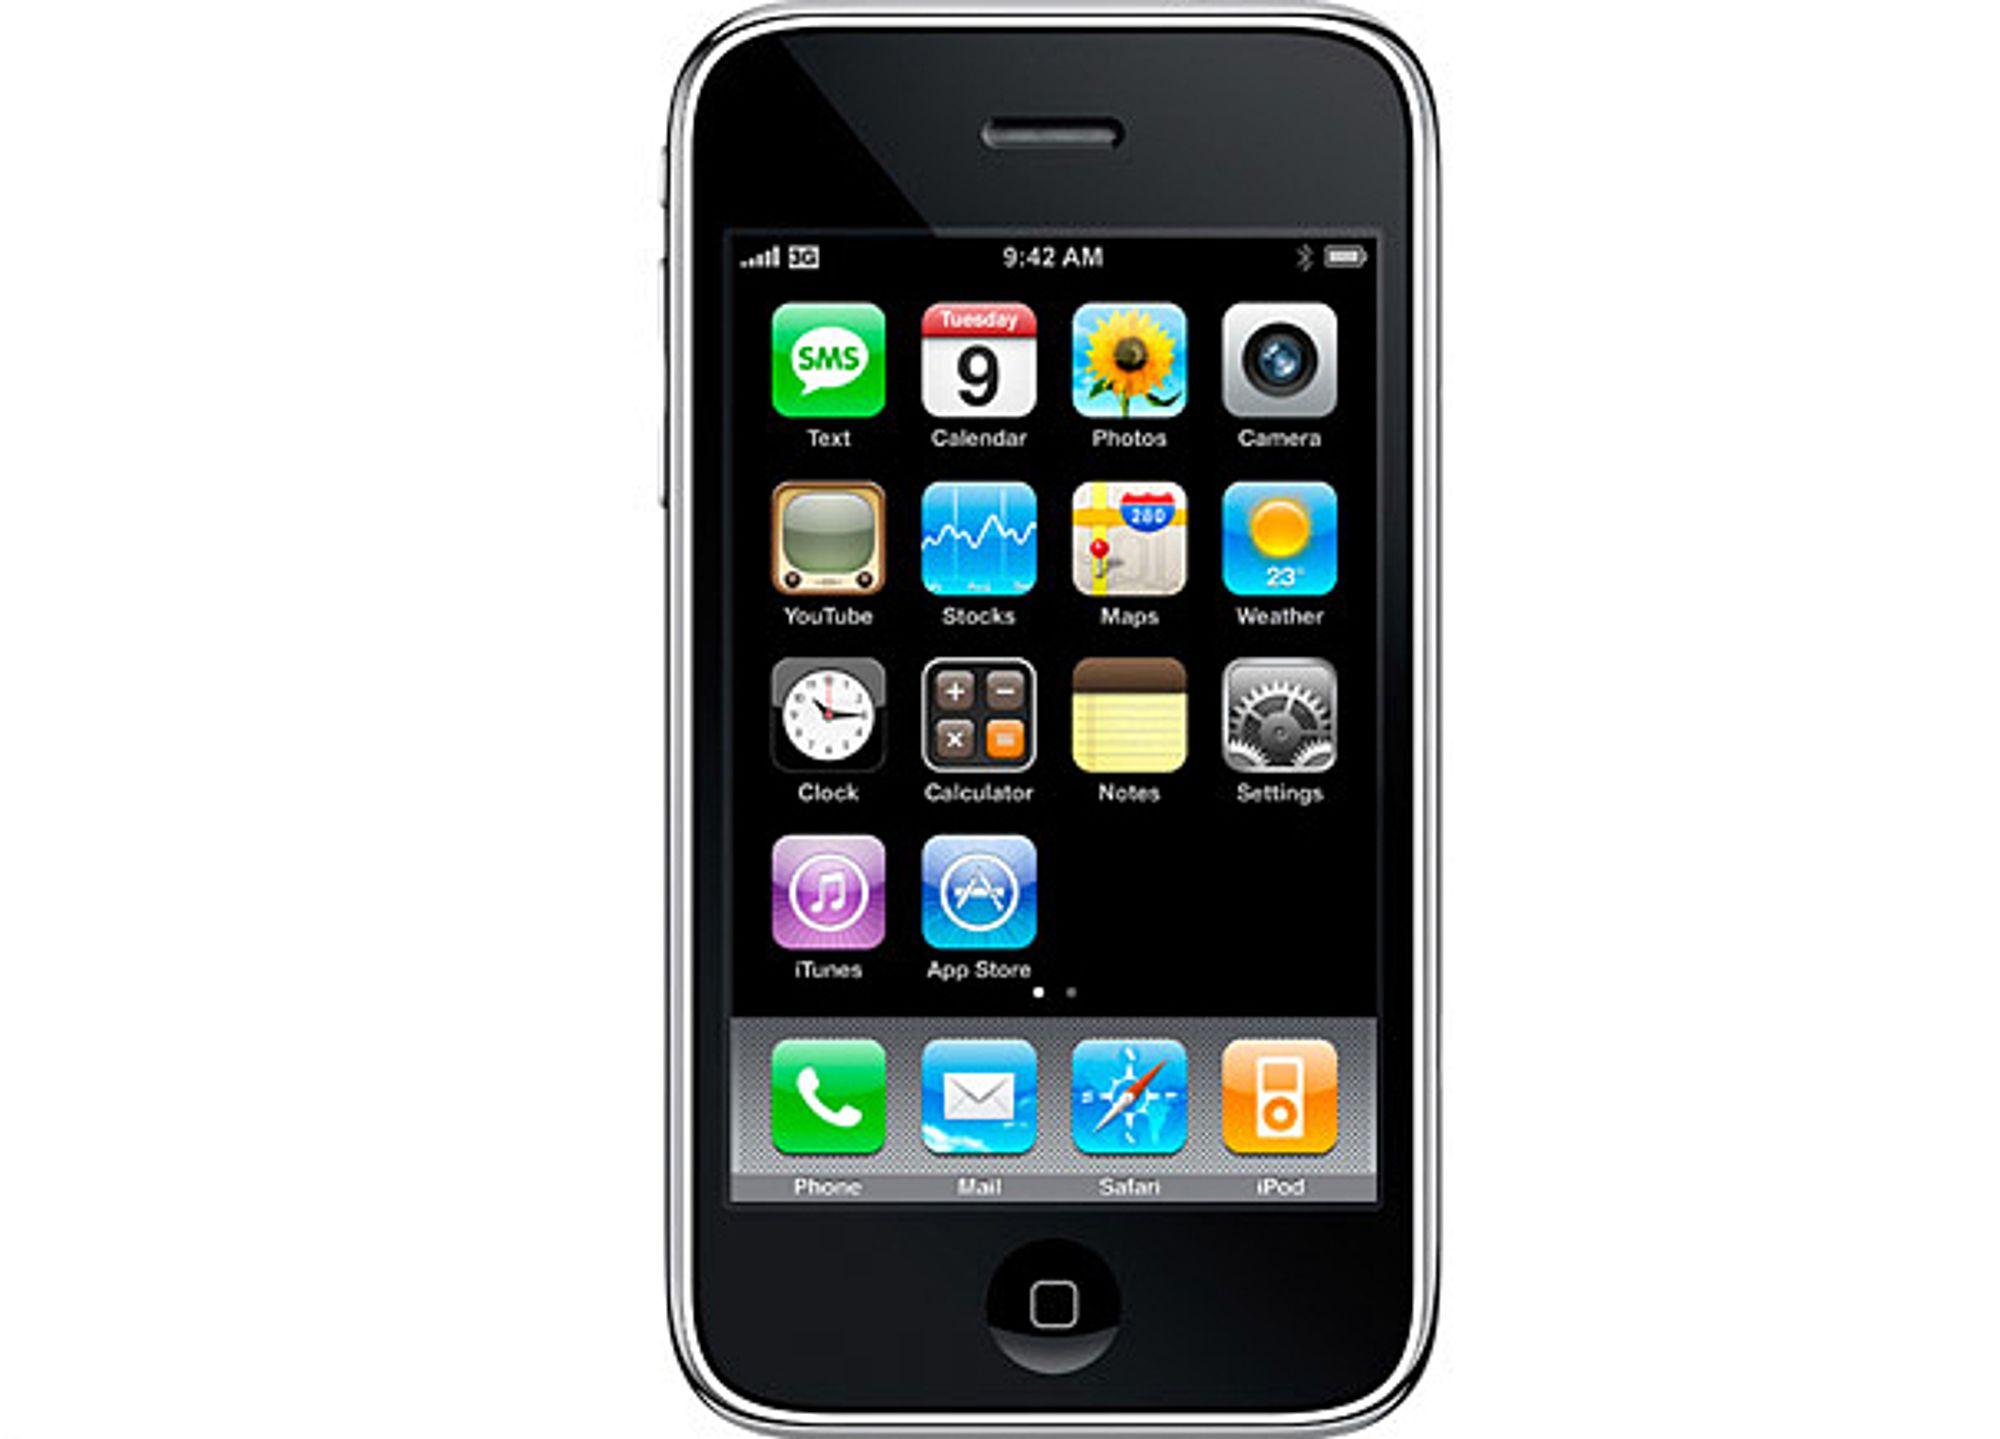 Apple iPhone 3G.